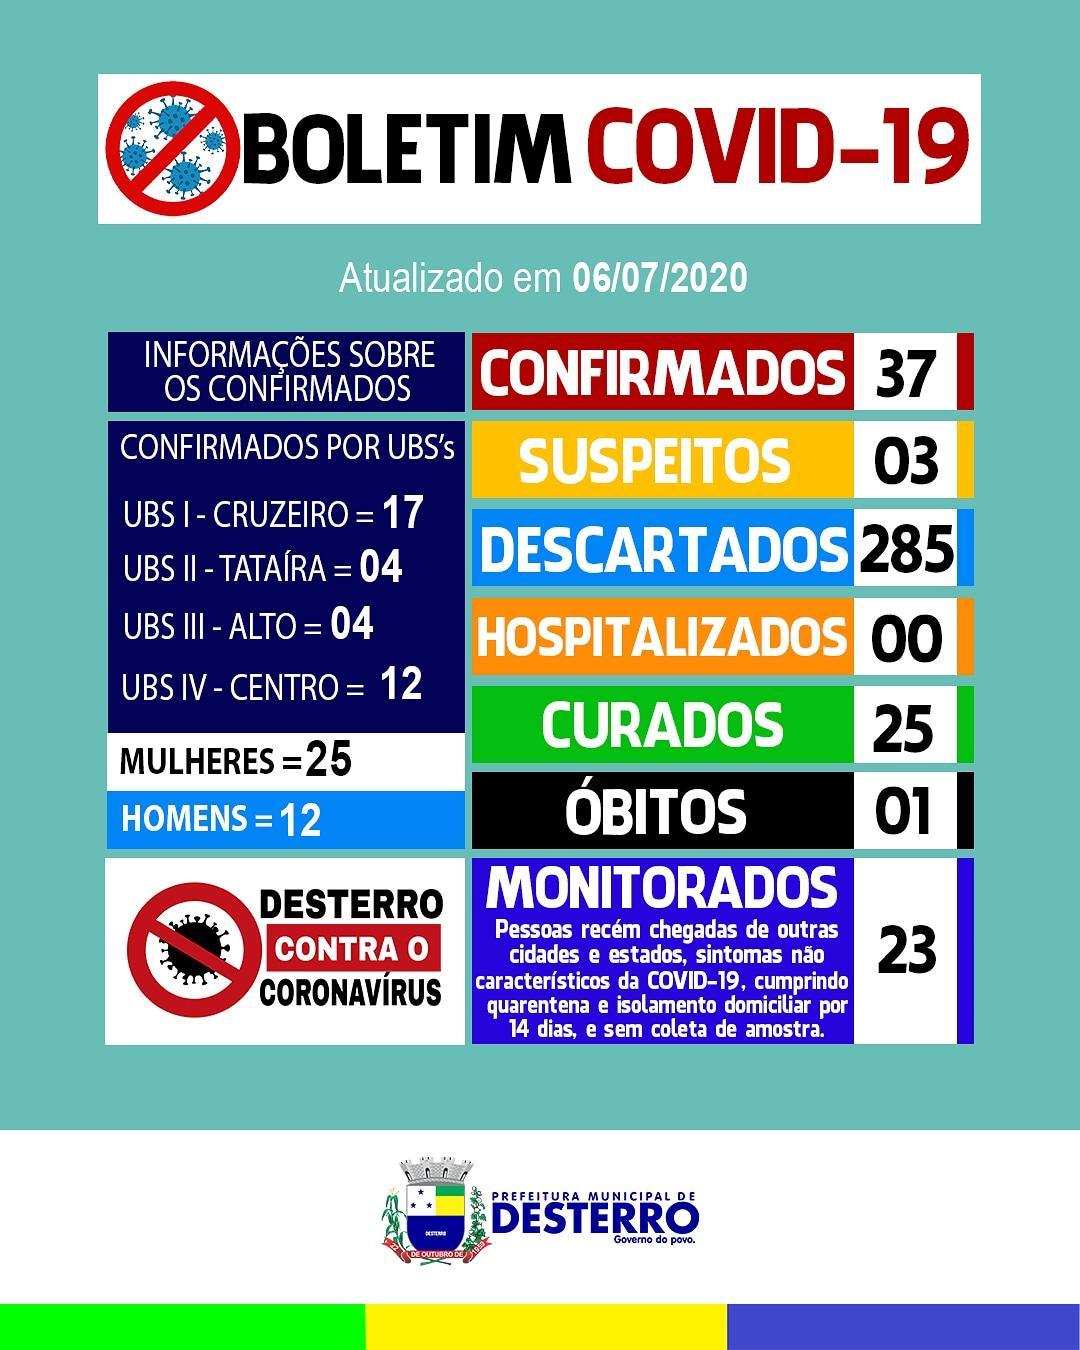 Boletim Covid-19 (06/07/2020)